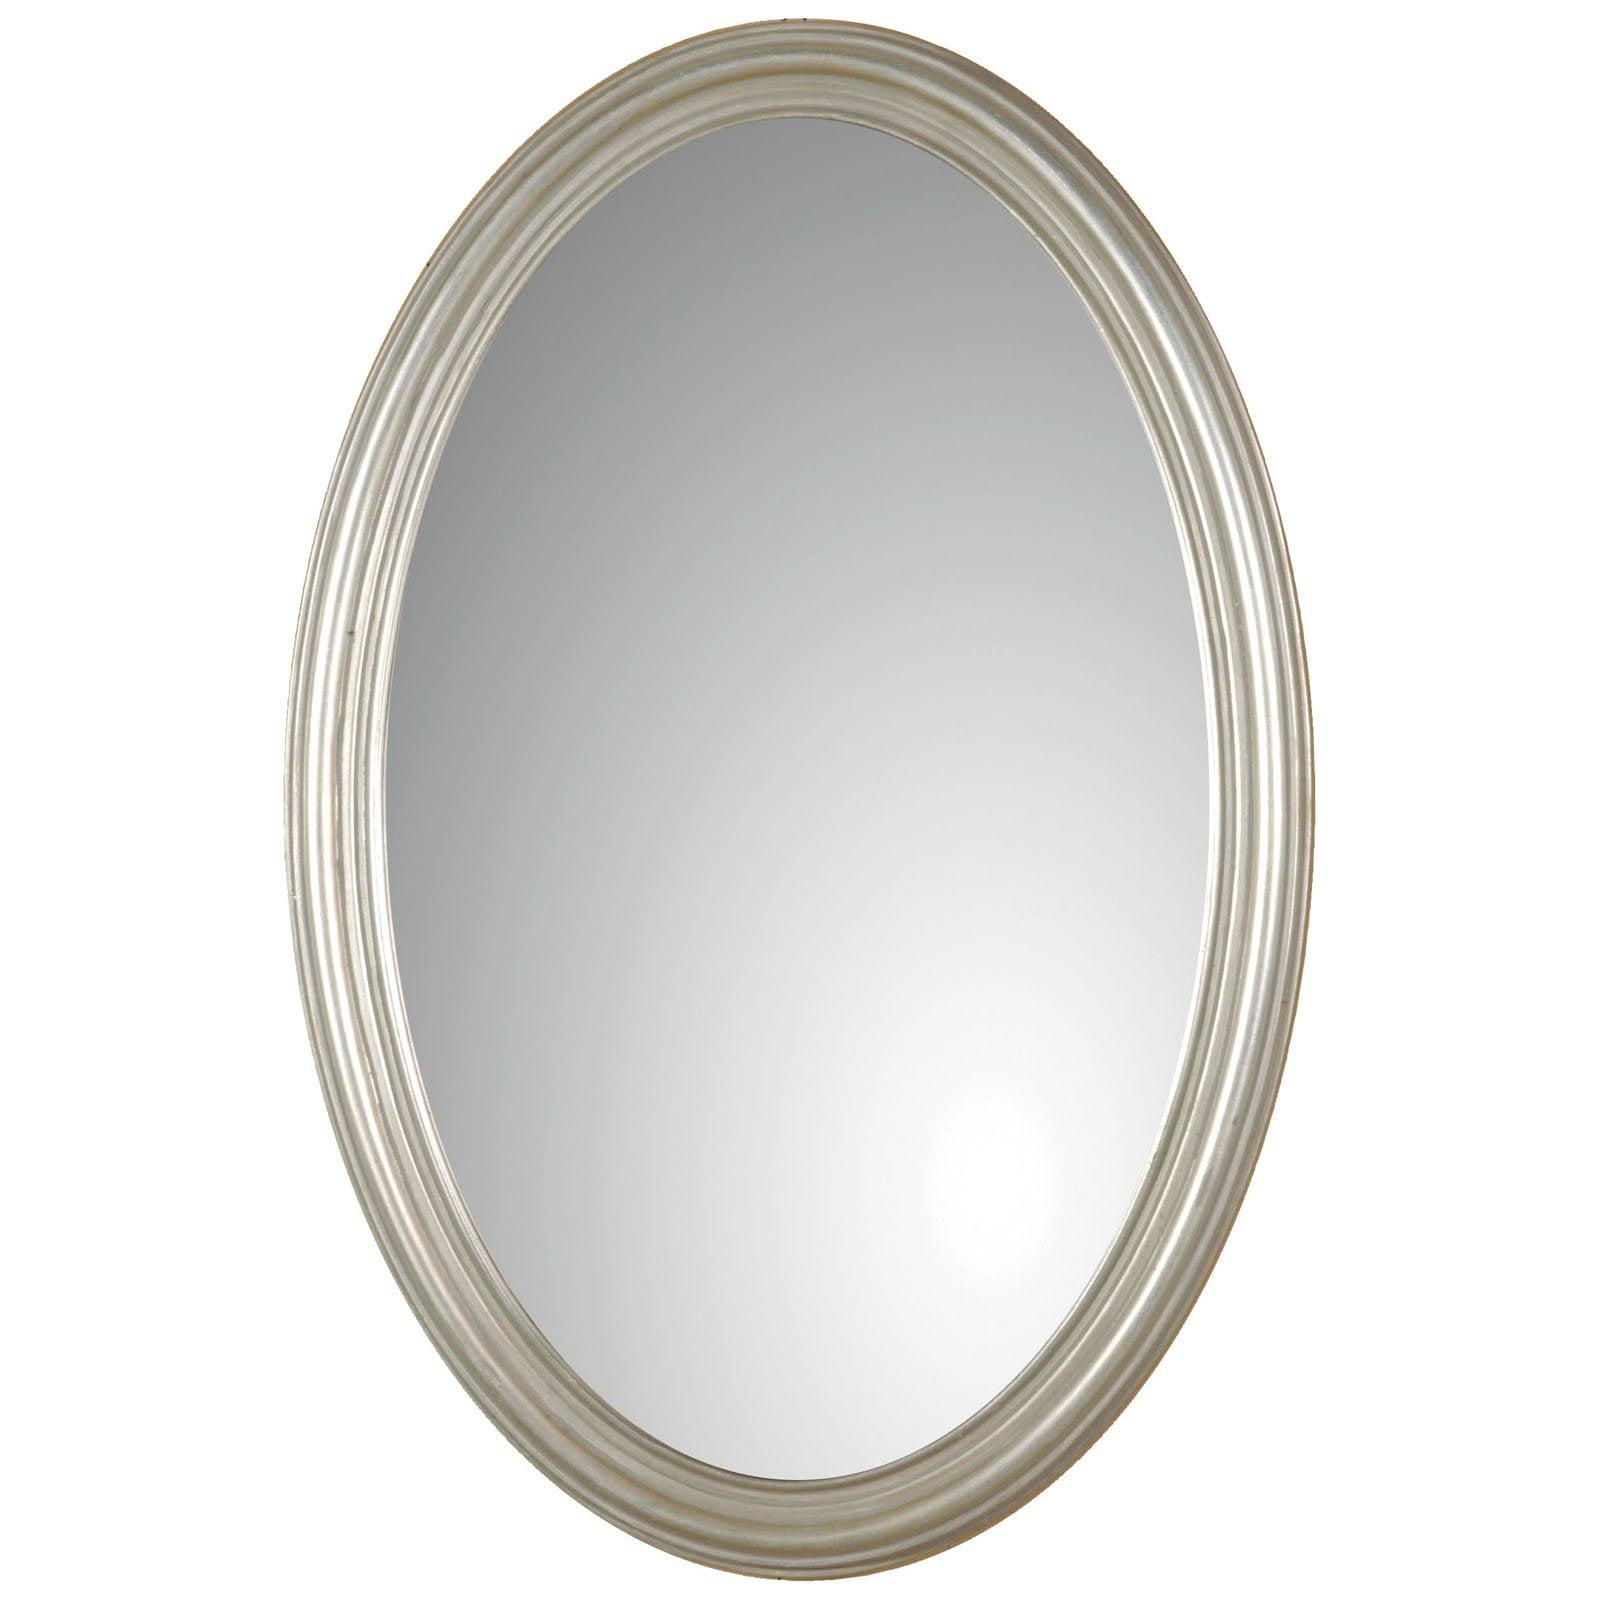 Uttermost Franklin Oval Silver Wall Mirror - 21W x 32H in. - Walmart.com